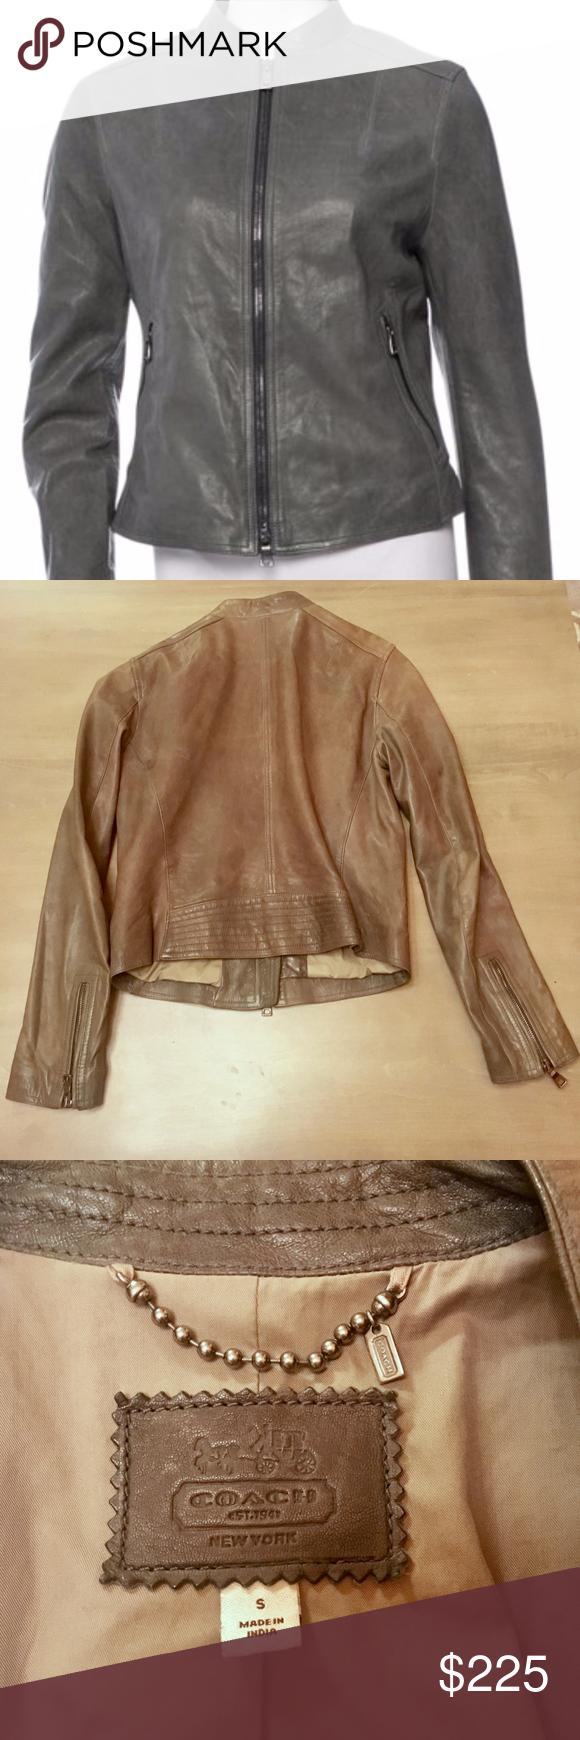 Coach Slate F82389 Kra Racer Leather Jacket Very nice